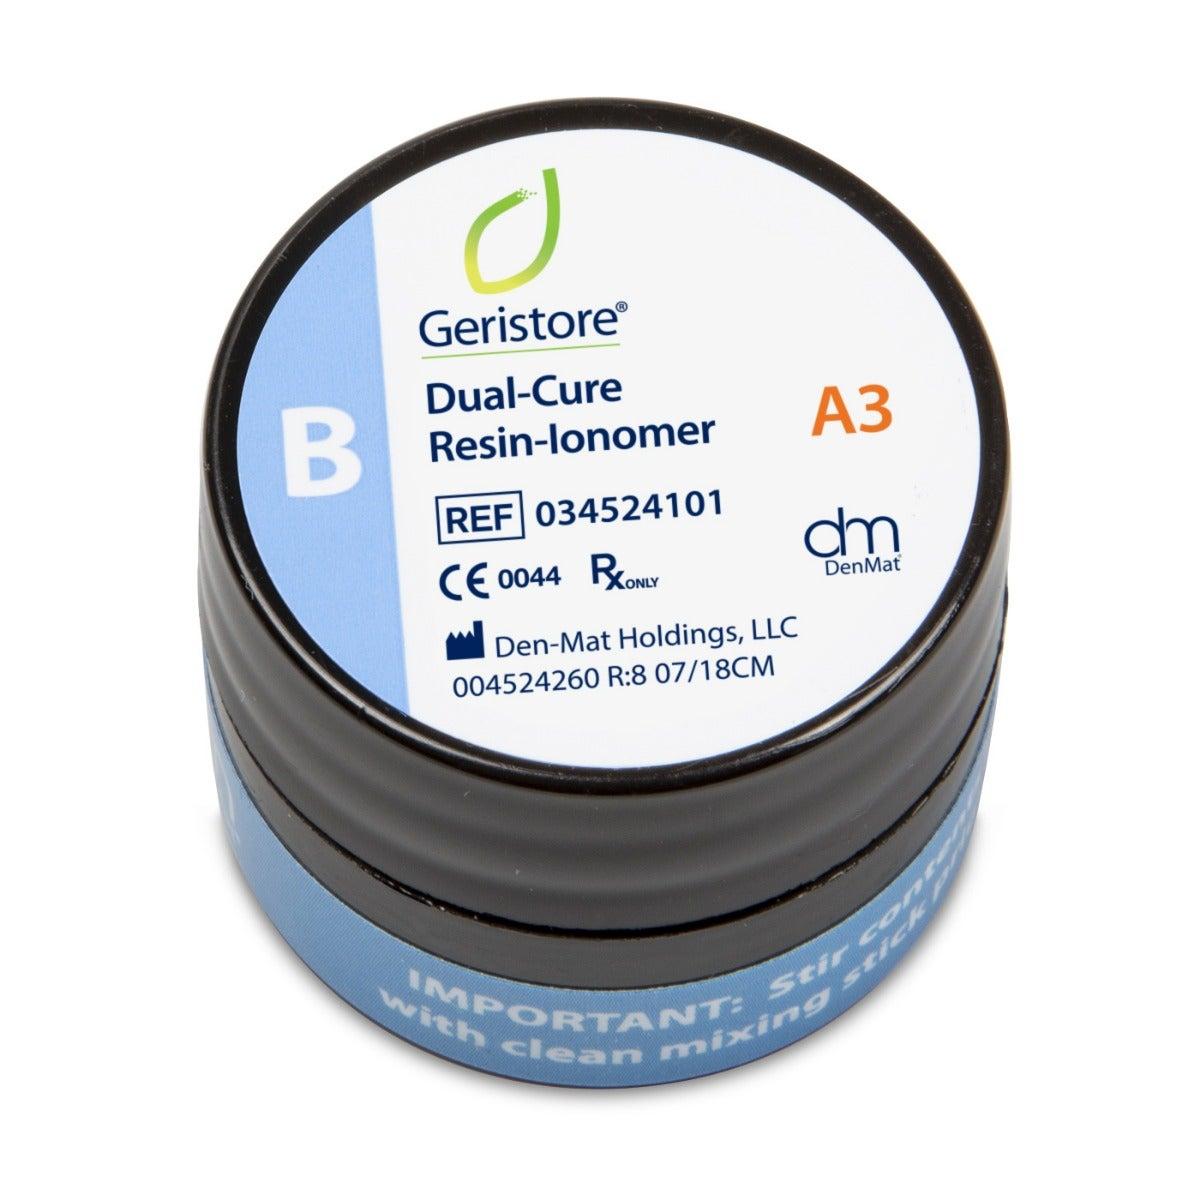 Dental Resin-Ionomer - Geristore B Paste A3